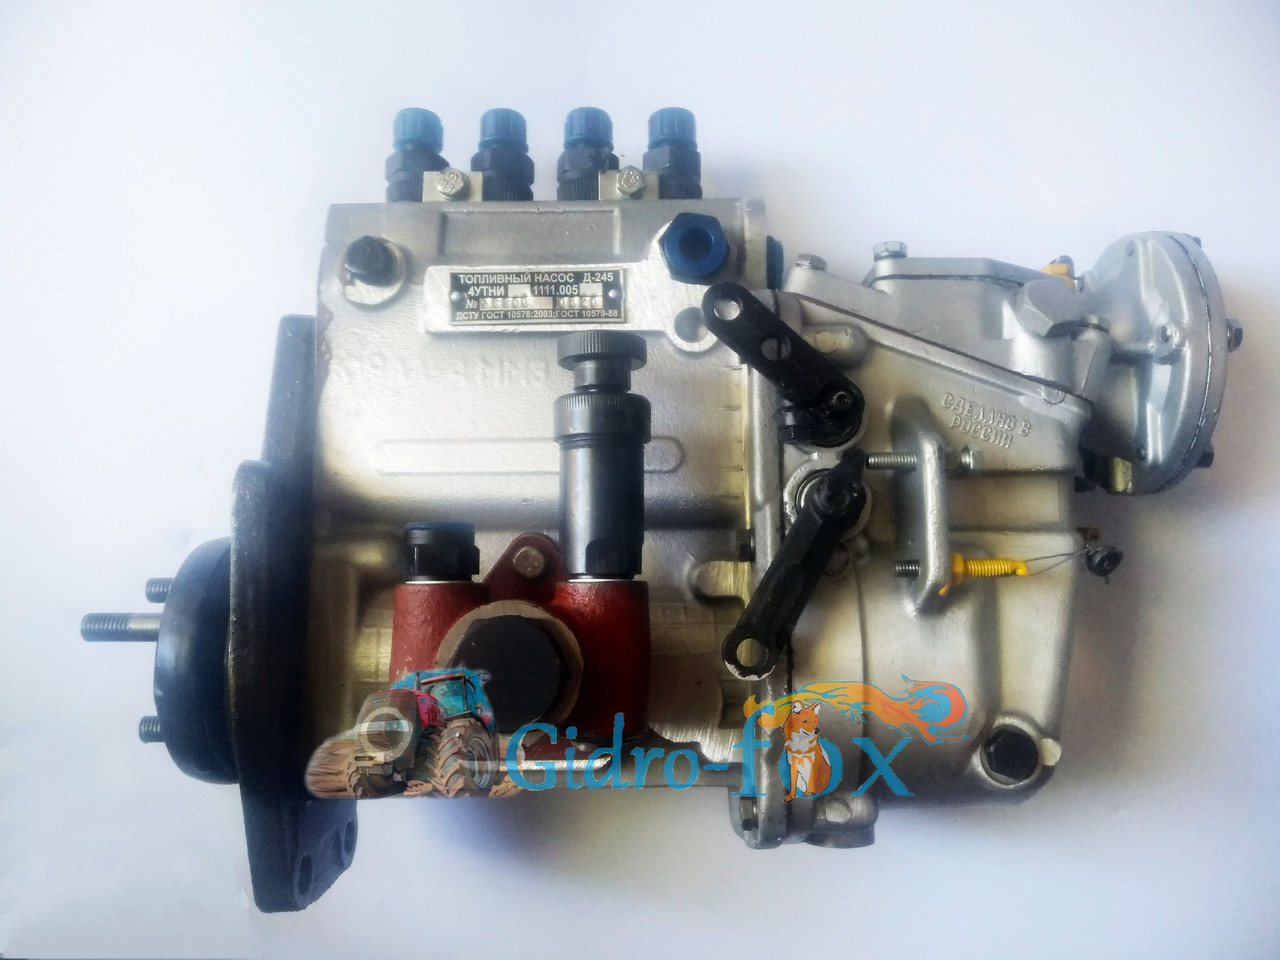 Топливный насос (топливная аппаратура) ТНВД МТЗ-80, МТЗ-82, ЗиЛ-5301 «Бычок» (Д-245) Кт.Н. 4УТНИ-Т-1111005